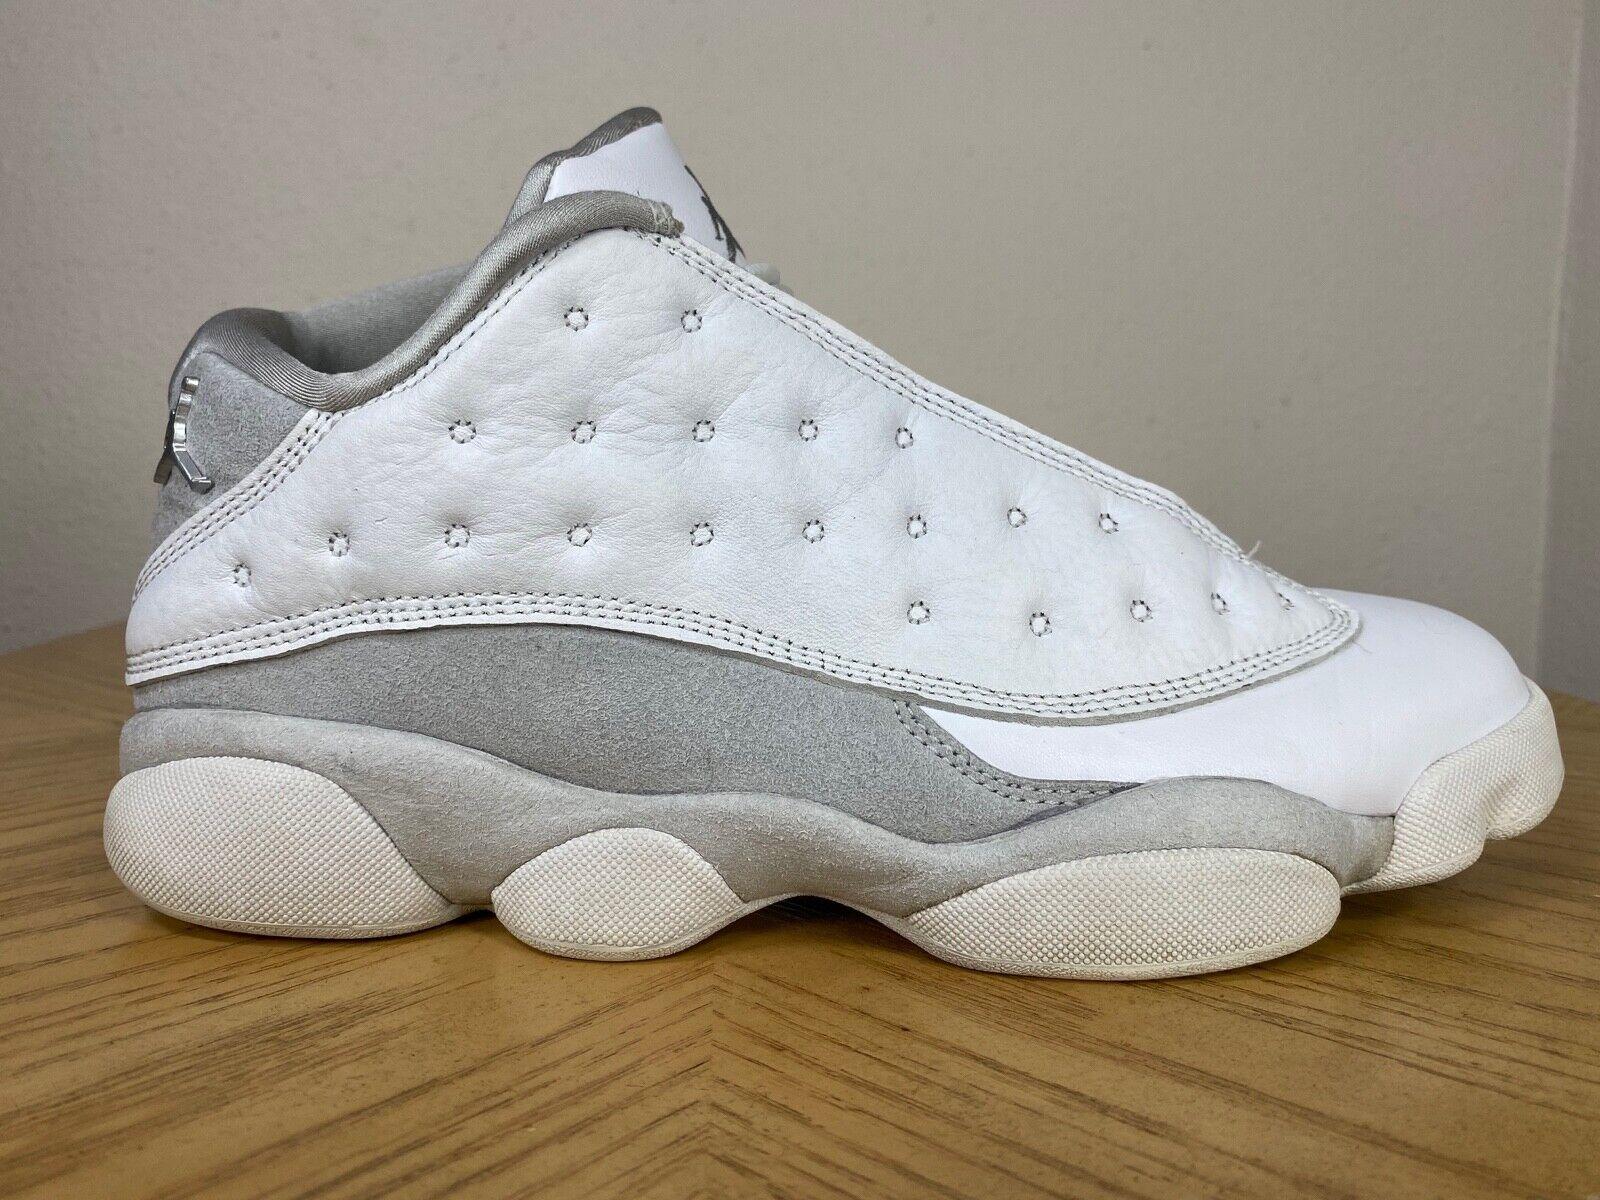 Air Jordan 13 Retro Low BG Pure Money